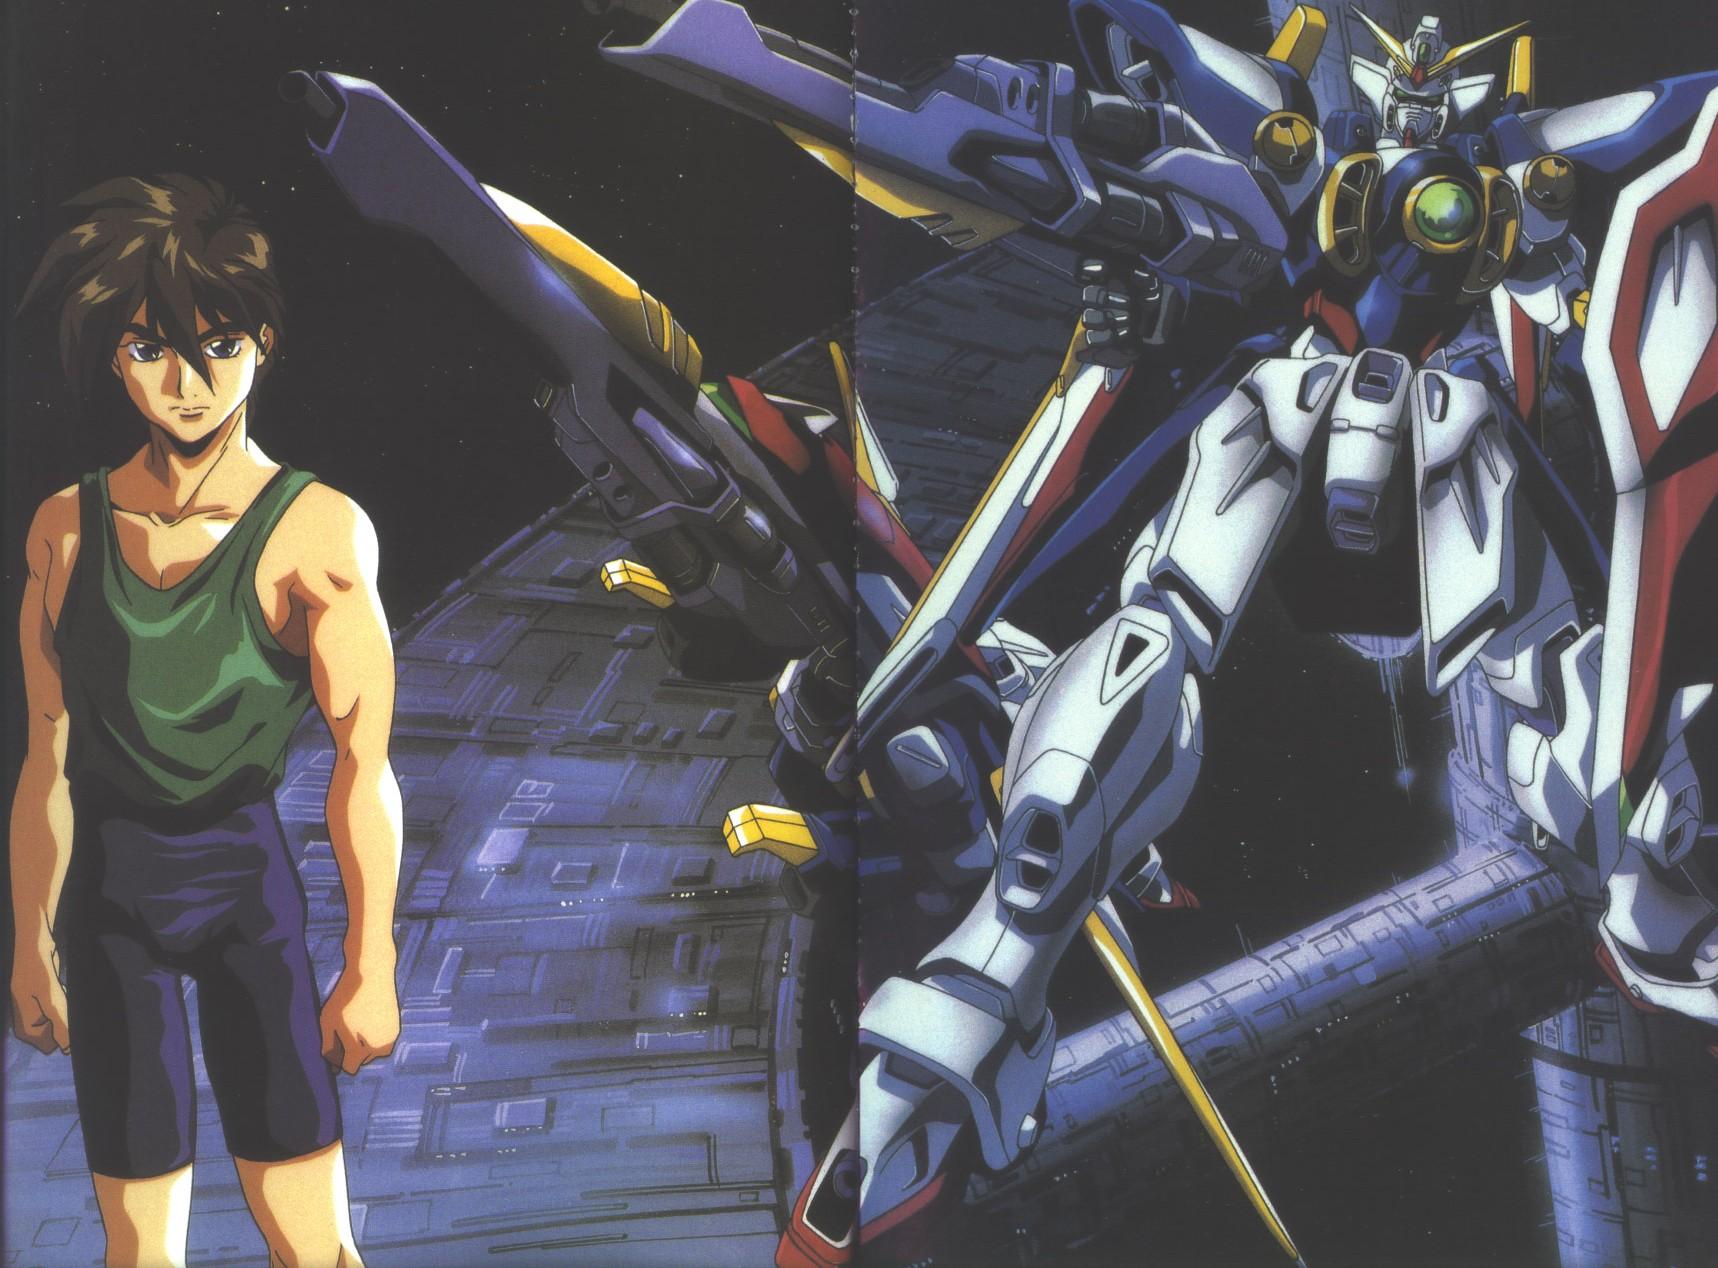 Mobile Suit Gundam Wing - Minitokyo